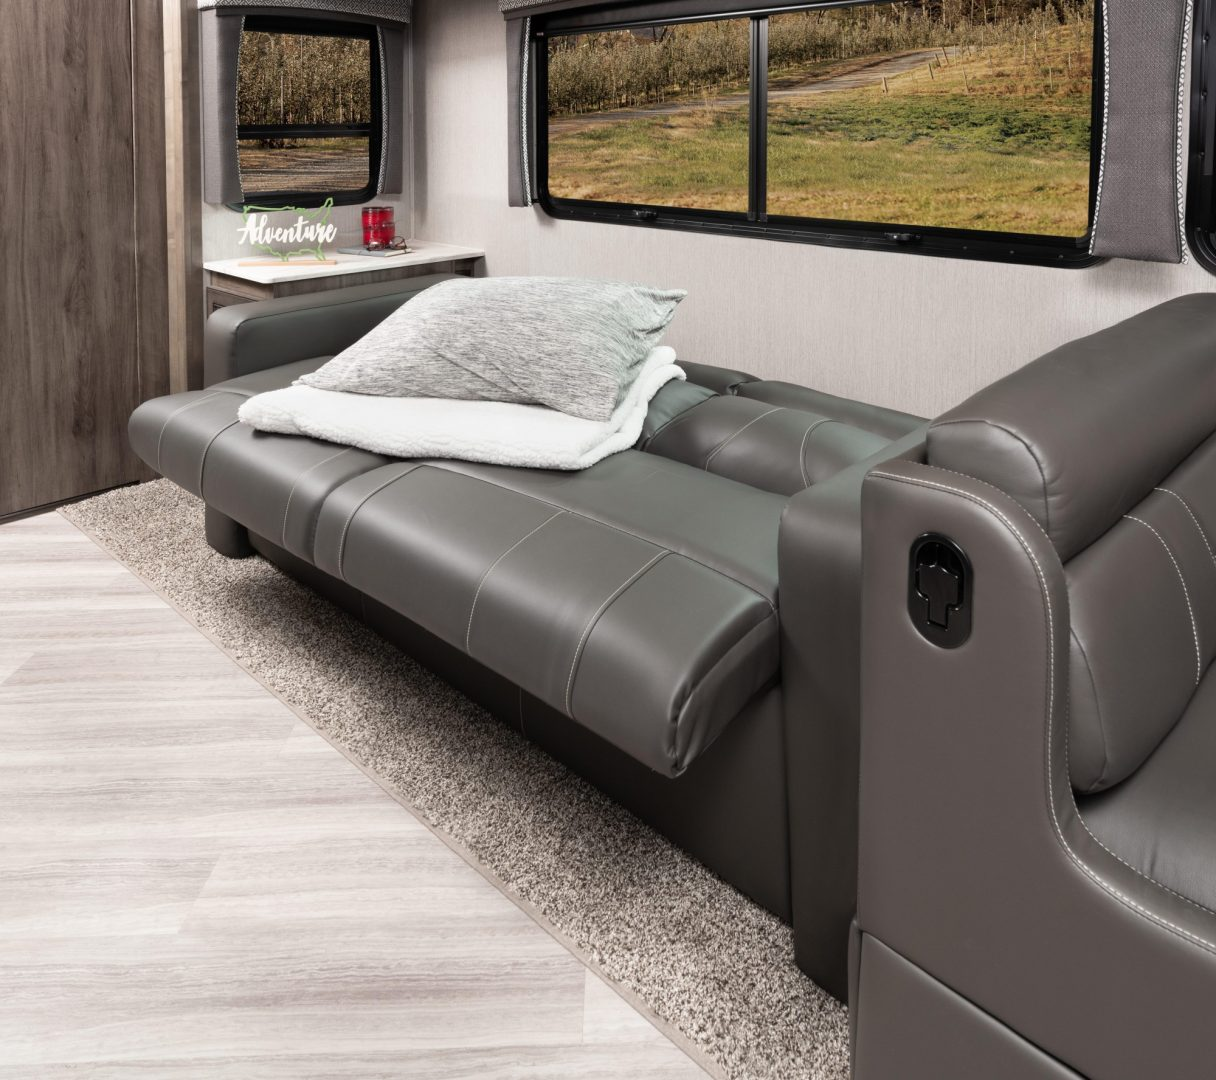 10 sofa VAC33 C moonscape WW MY22 5335 bed